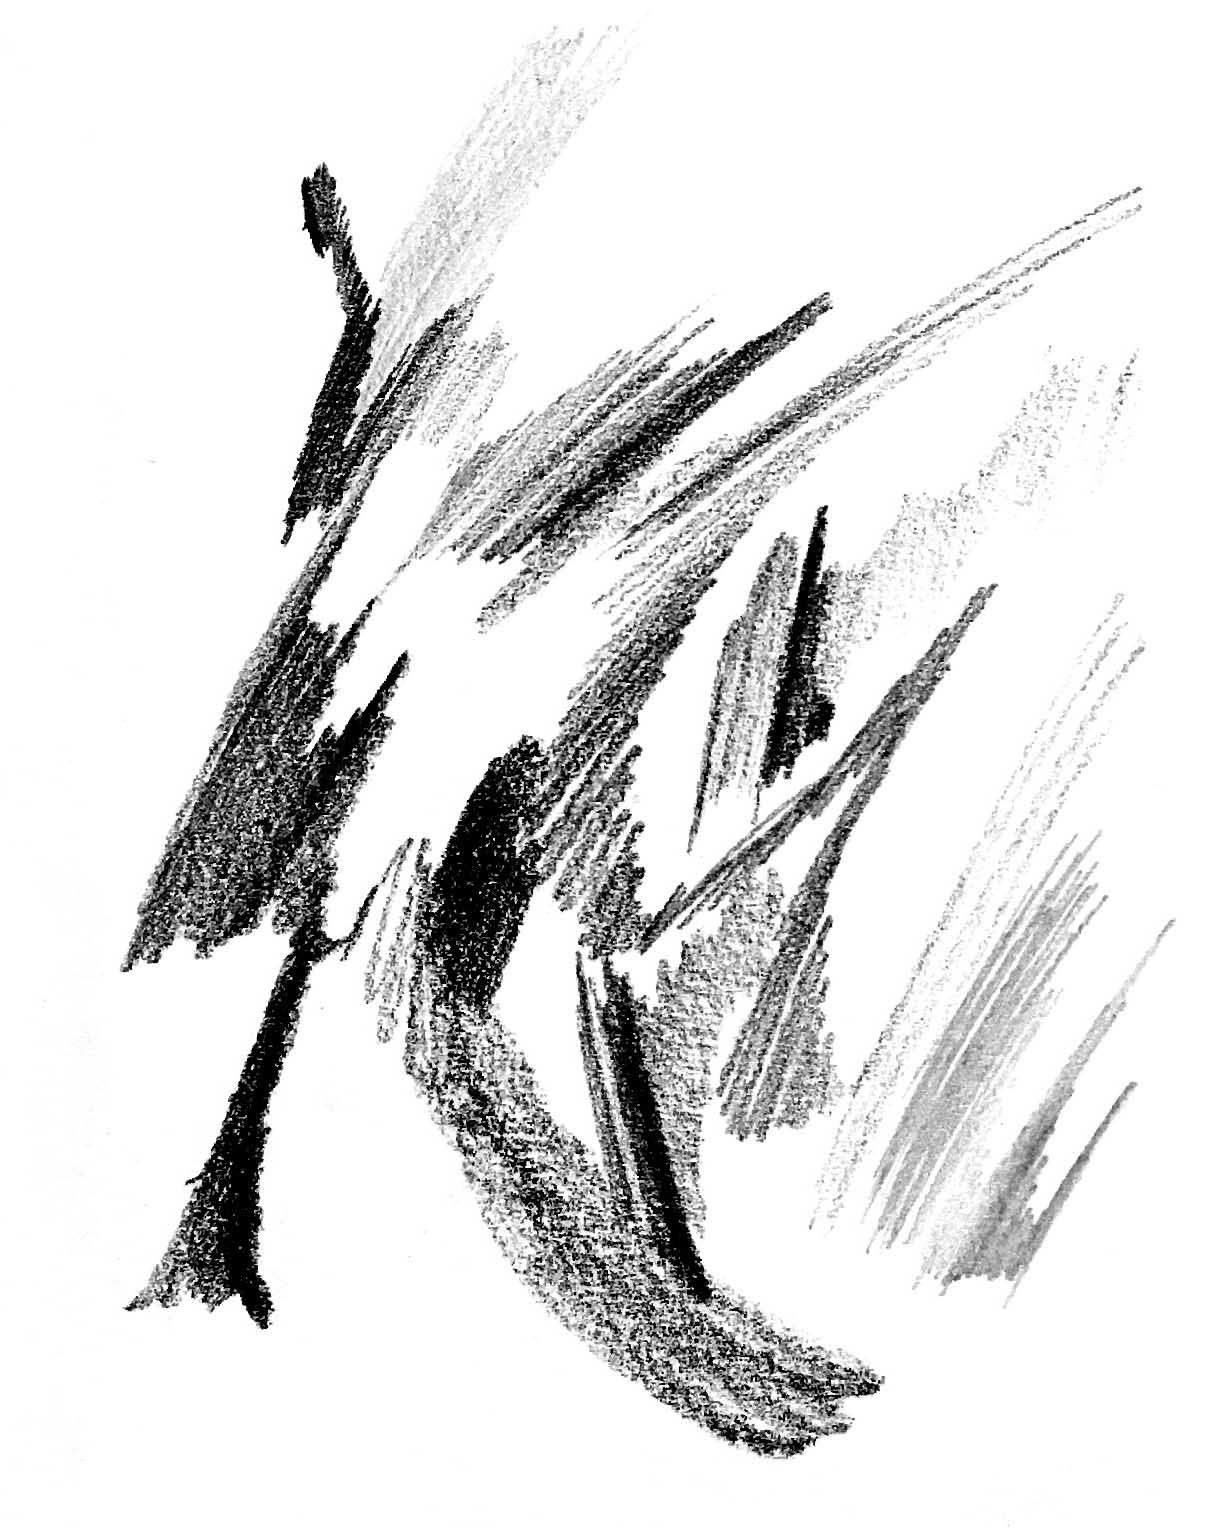 shades of nuance sketch.jpg